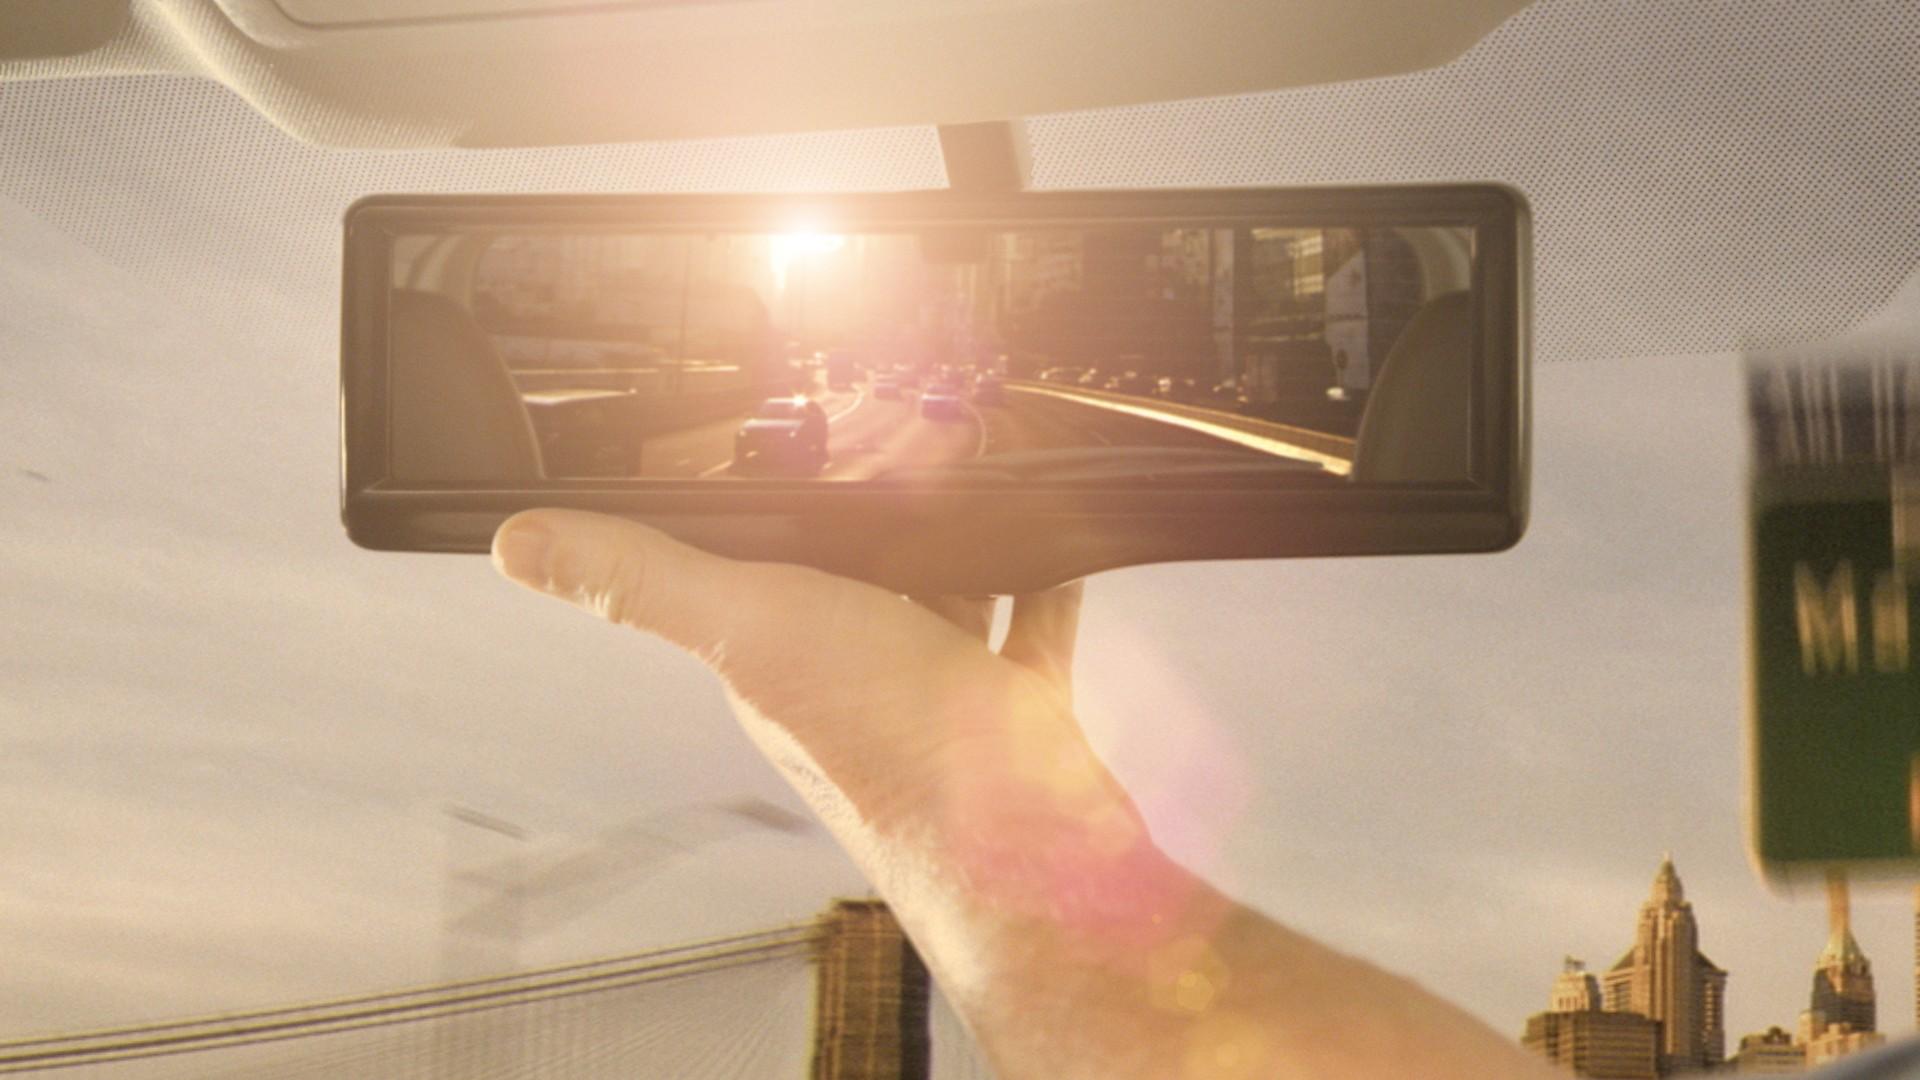 C mo funciona un retrovisor antideslumbramiento for Espejo retrovisor bebe con luz